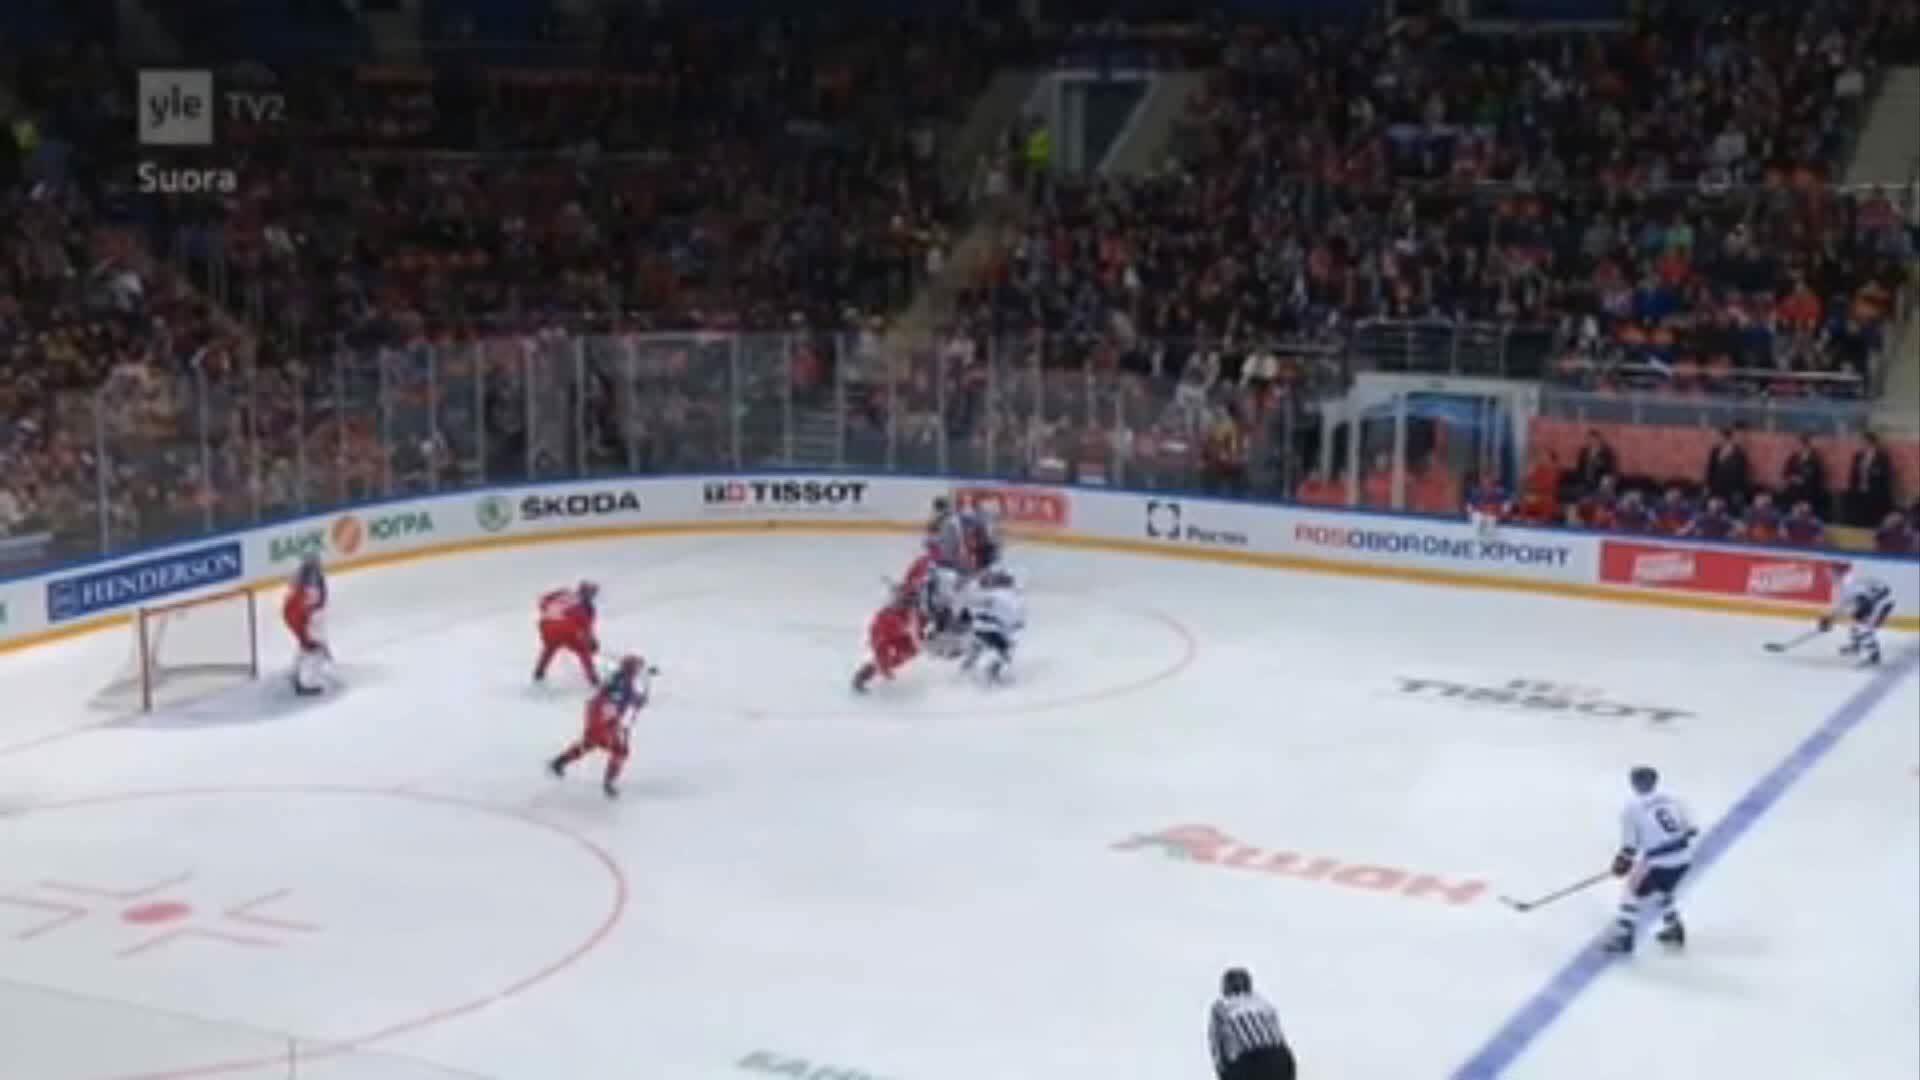 hockey, imagesofrussia, EHT Russia-Finland 1-1 Koskiranta GIFs